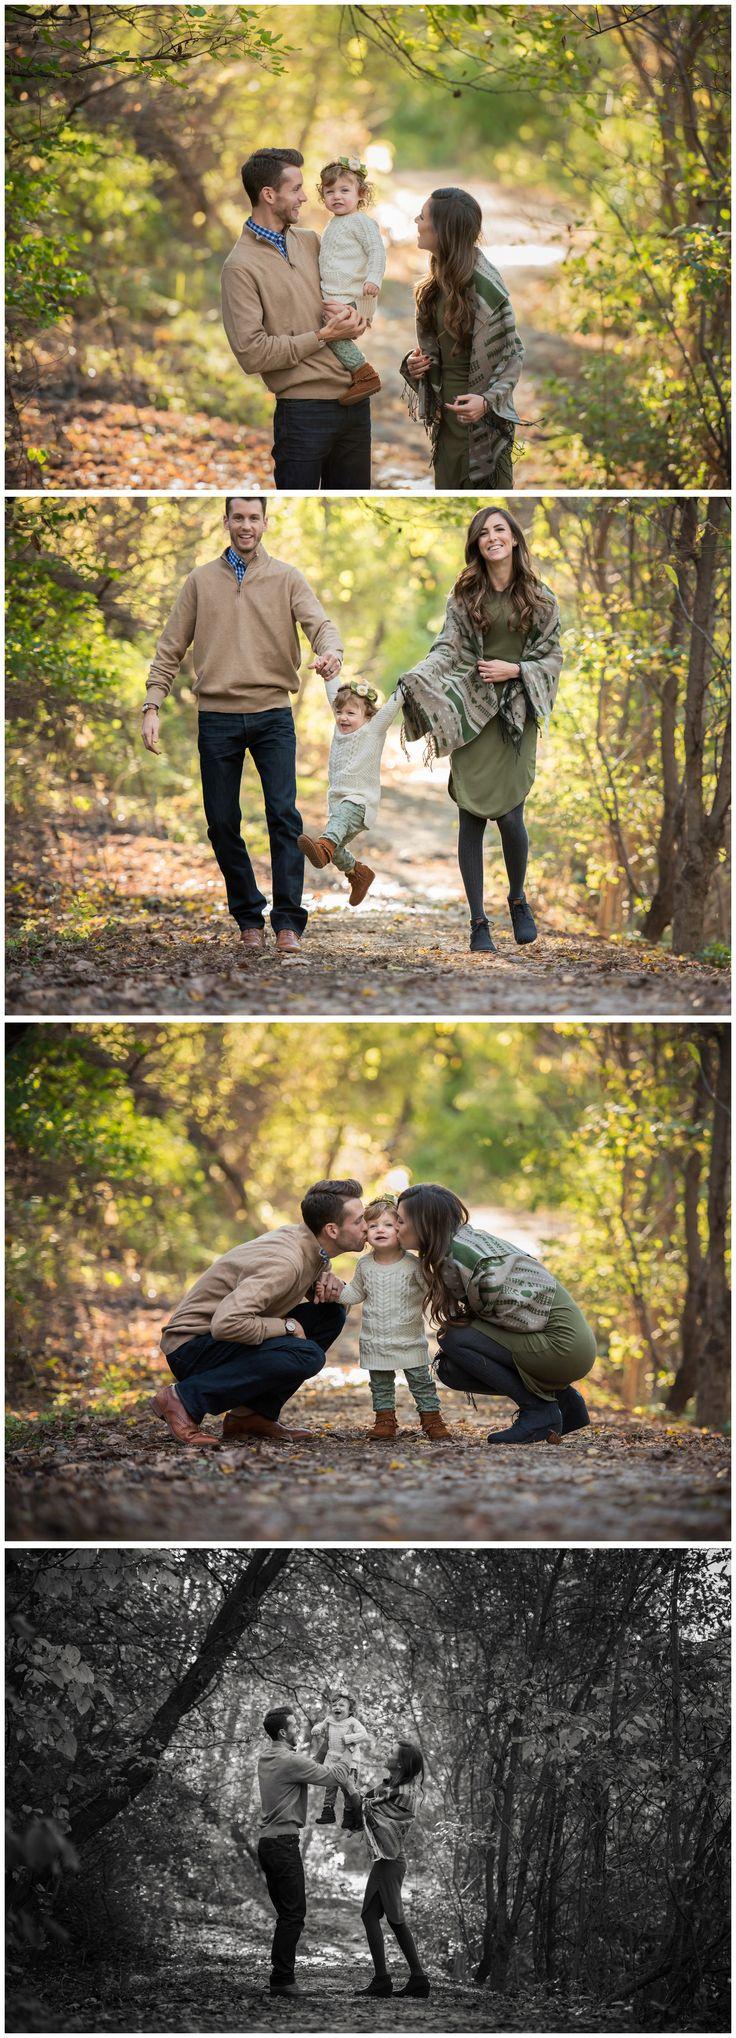 Fall family photoshoot   St Louis family photographer   Vanessa Smith Photography